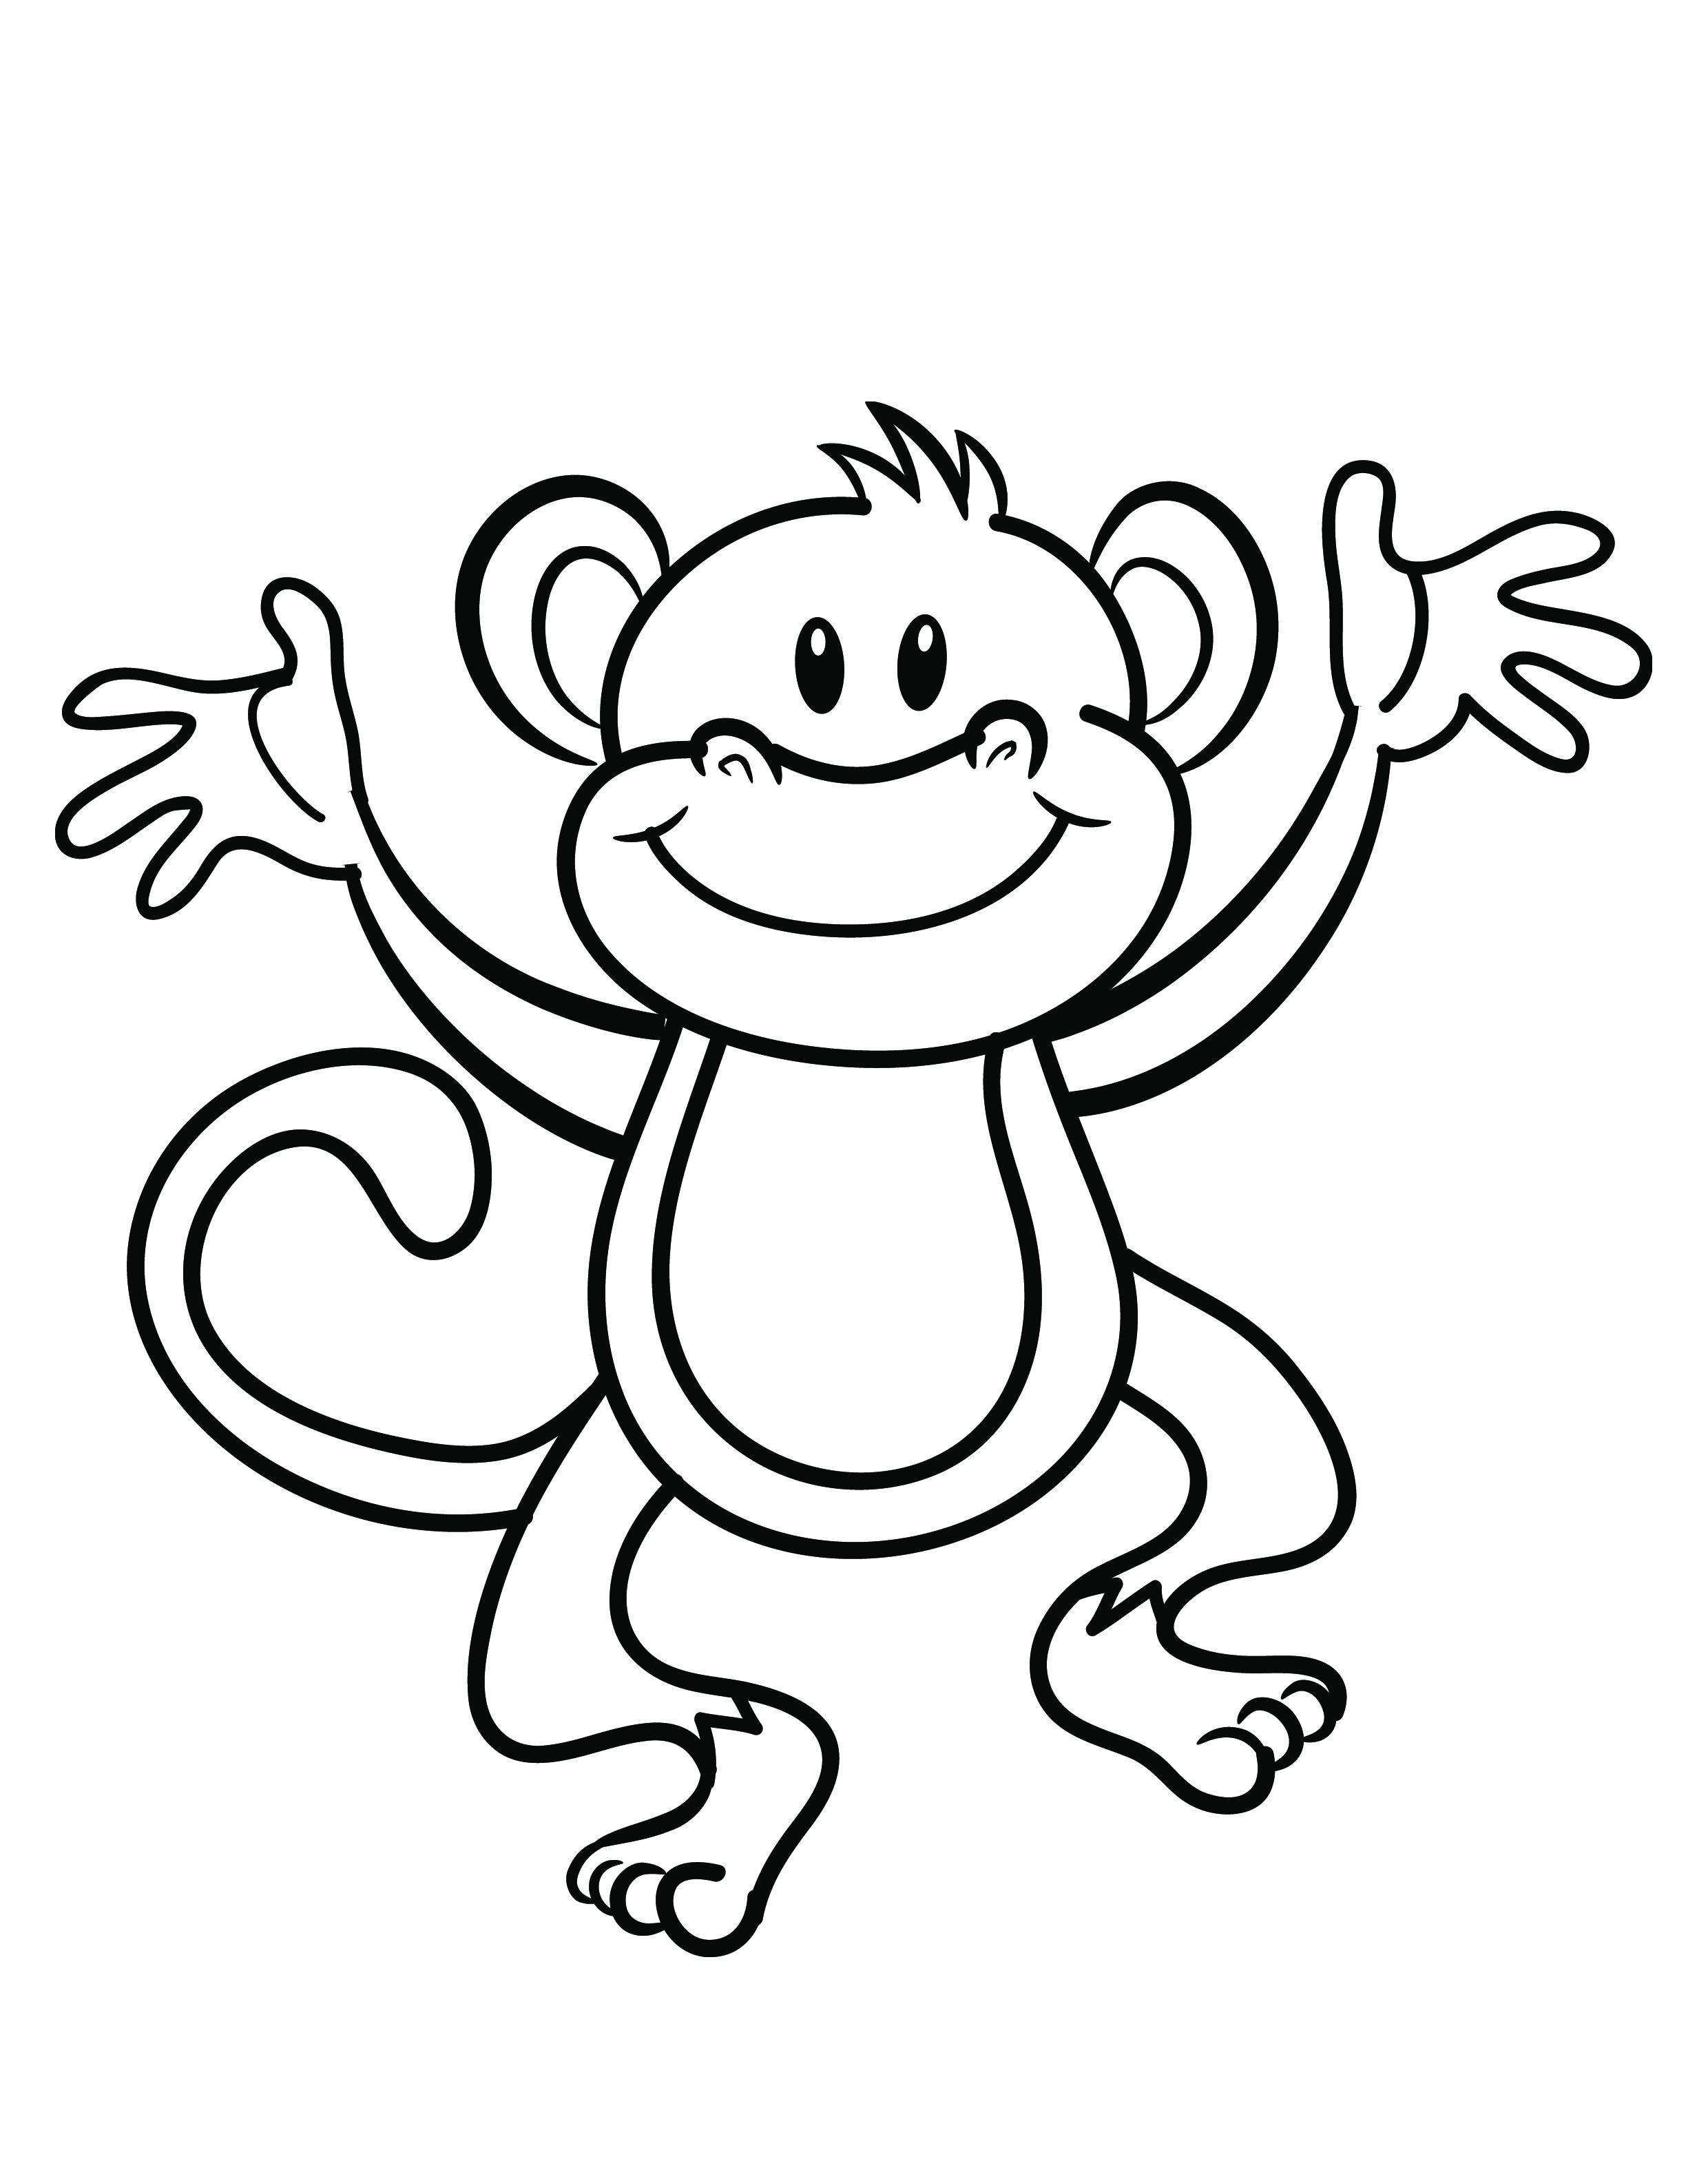 Monkey Body Template Free Printable Monkey Coloring Page Cj 1st Birthday